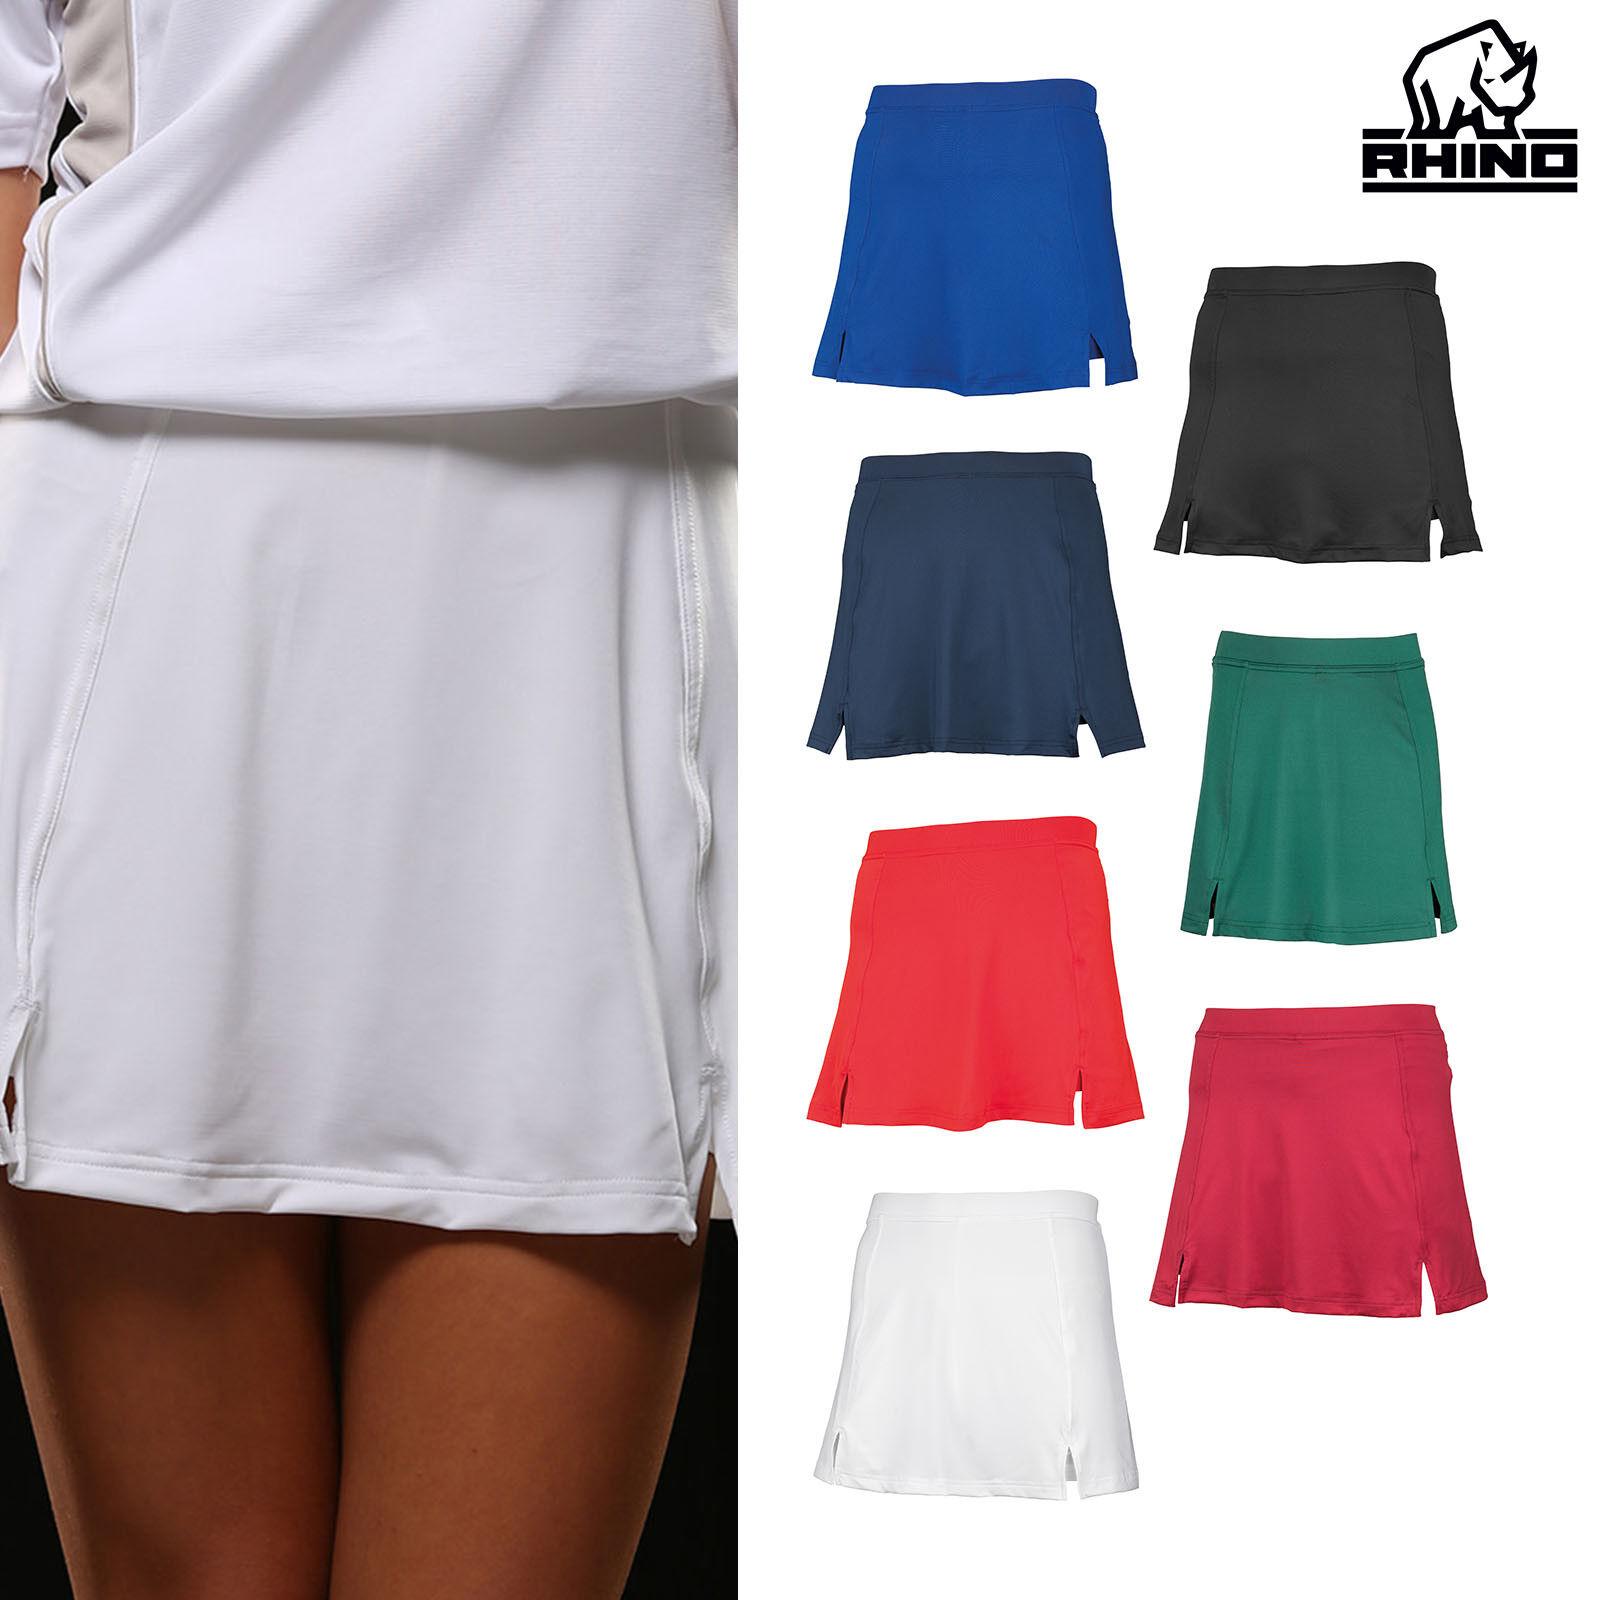 Rhino Women's  Sports Performance Skirt RH012  deals sale